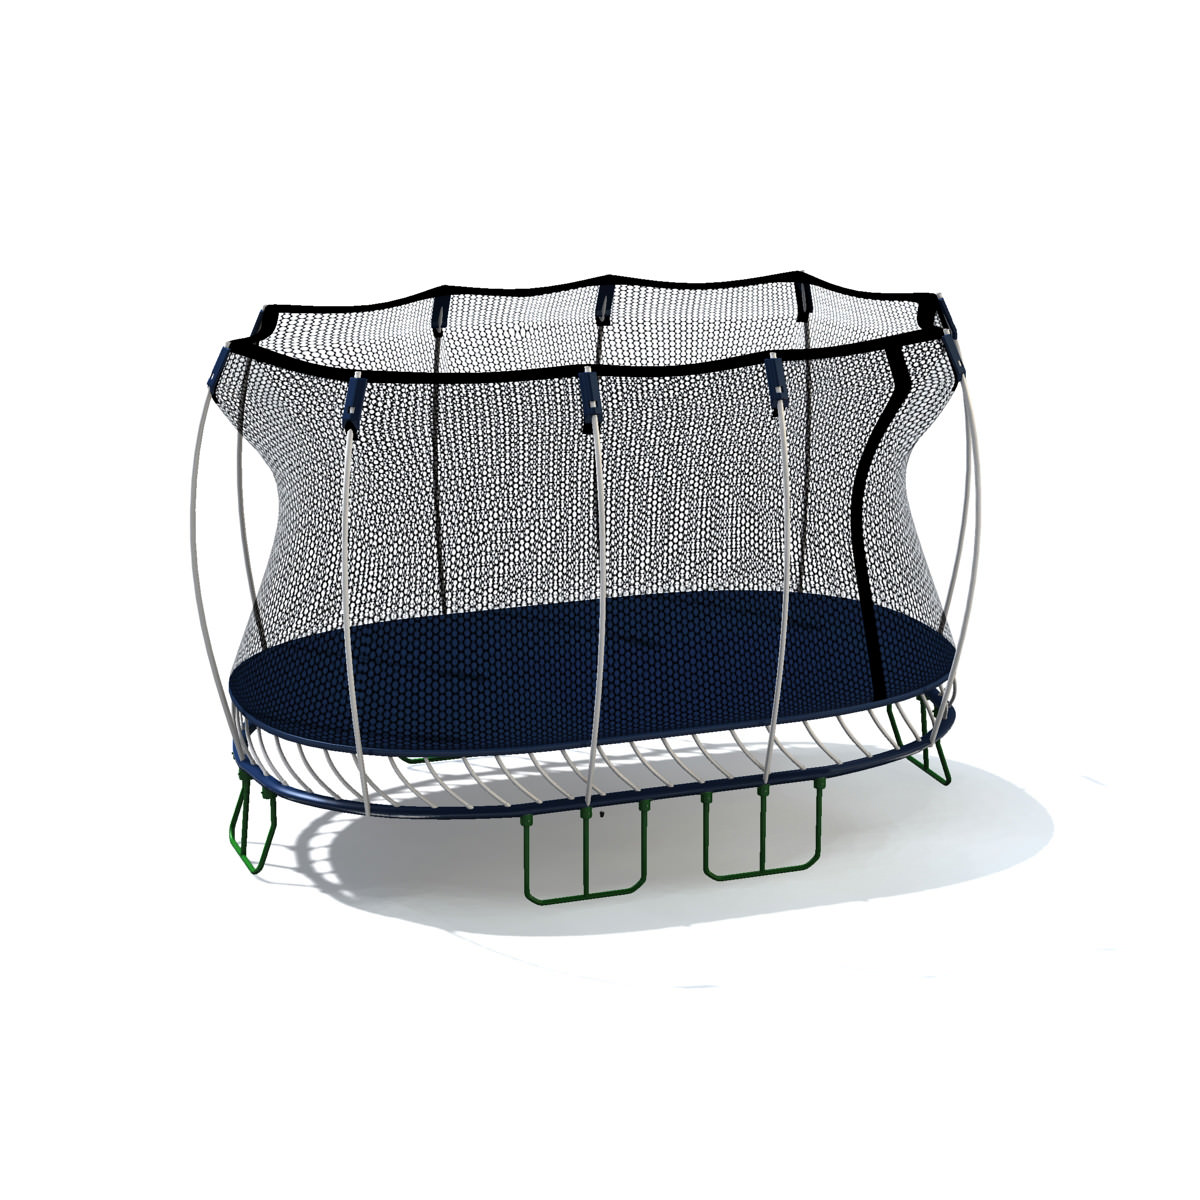 Trampoline springfree 3d model obj fbx ma mb for Springfree trampoline